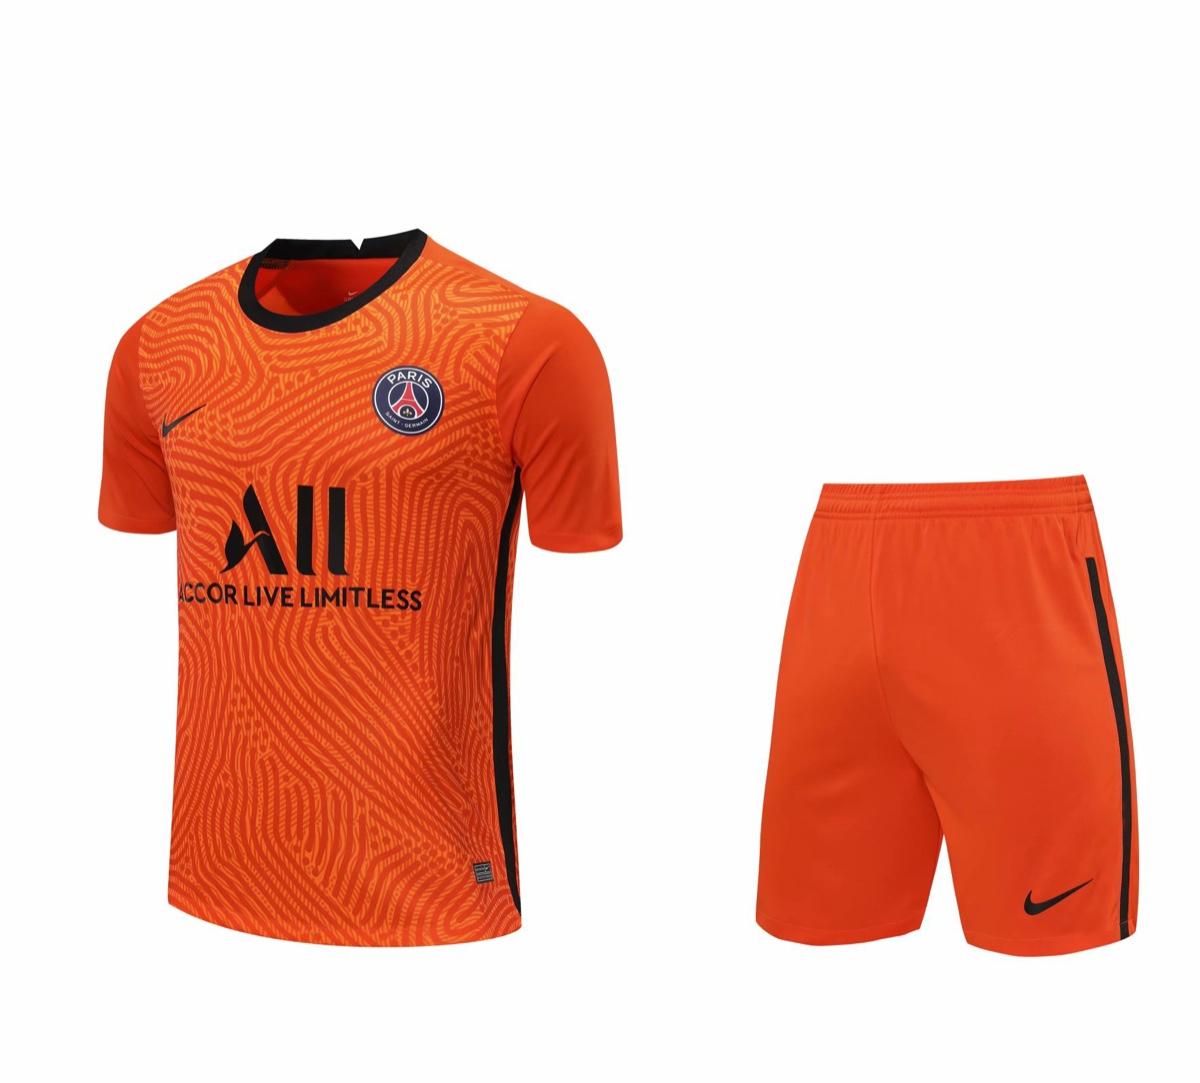 פריז סן ז רמן 20 21 חליפות שוער R Sport